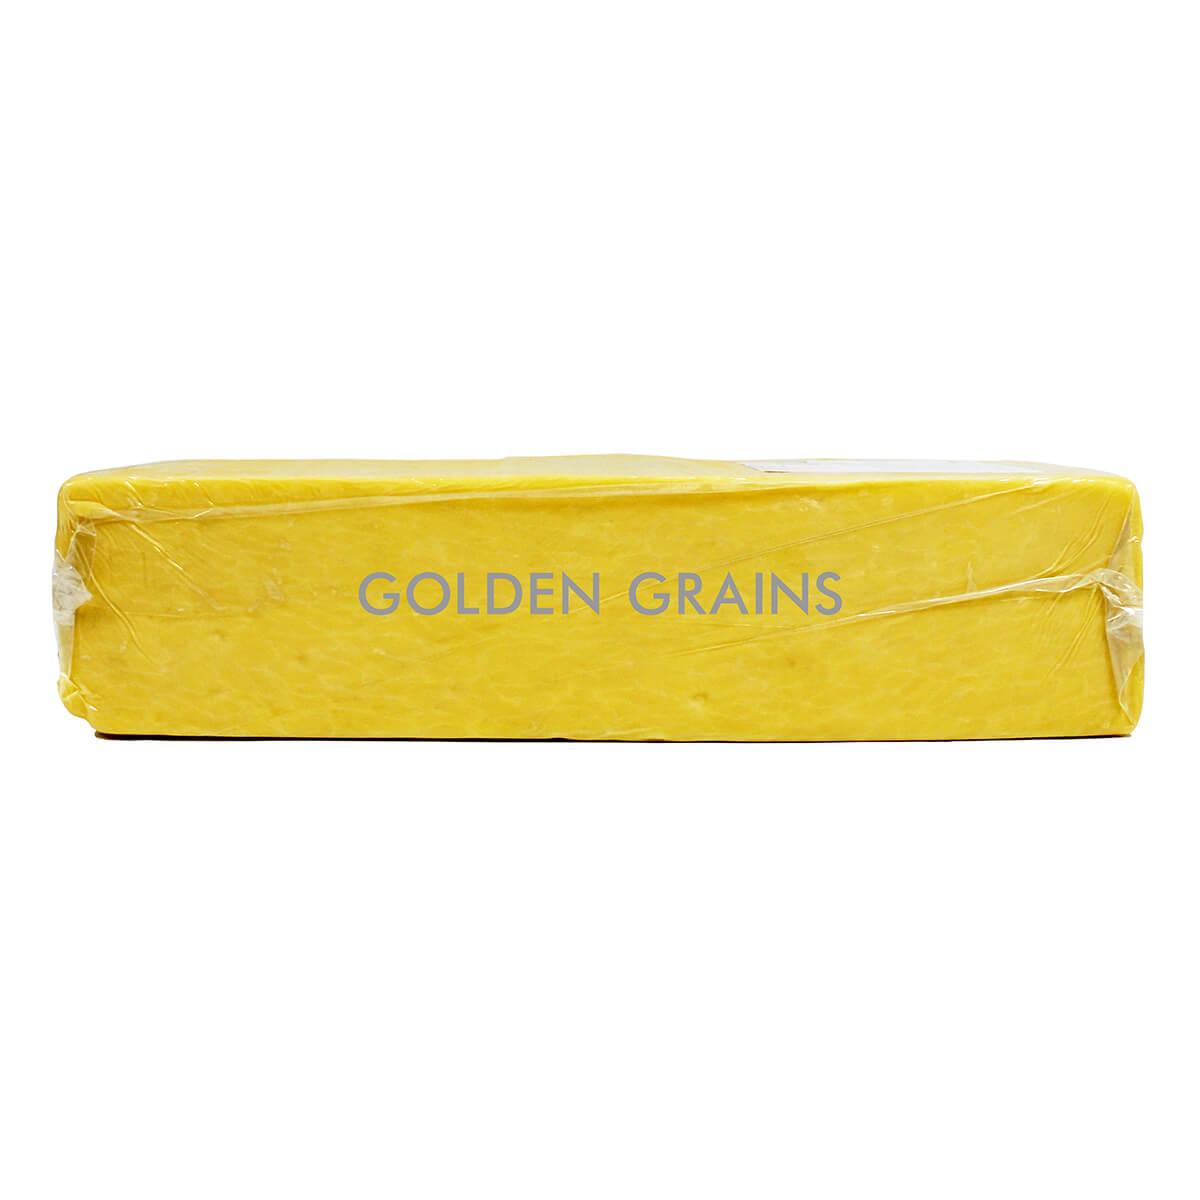 Golden Grains Dubai Export - Coombe Castle Cheese - Mild Cheddar - Side.jpg